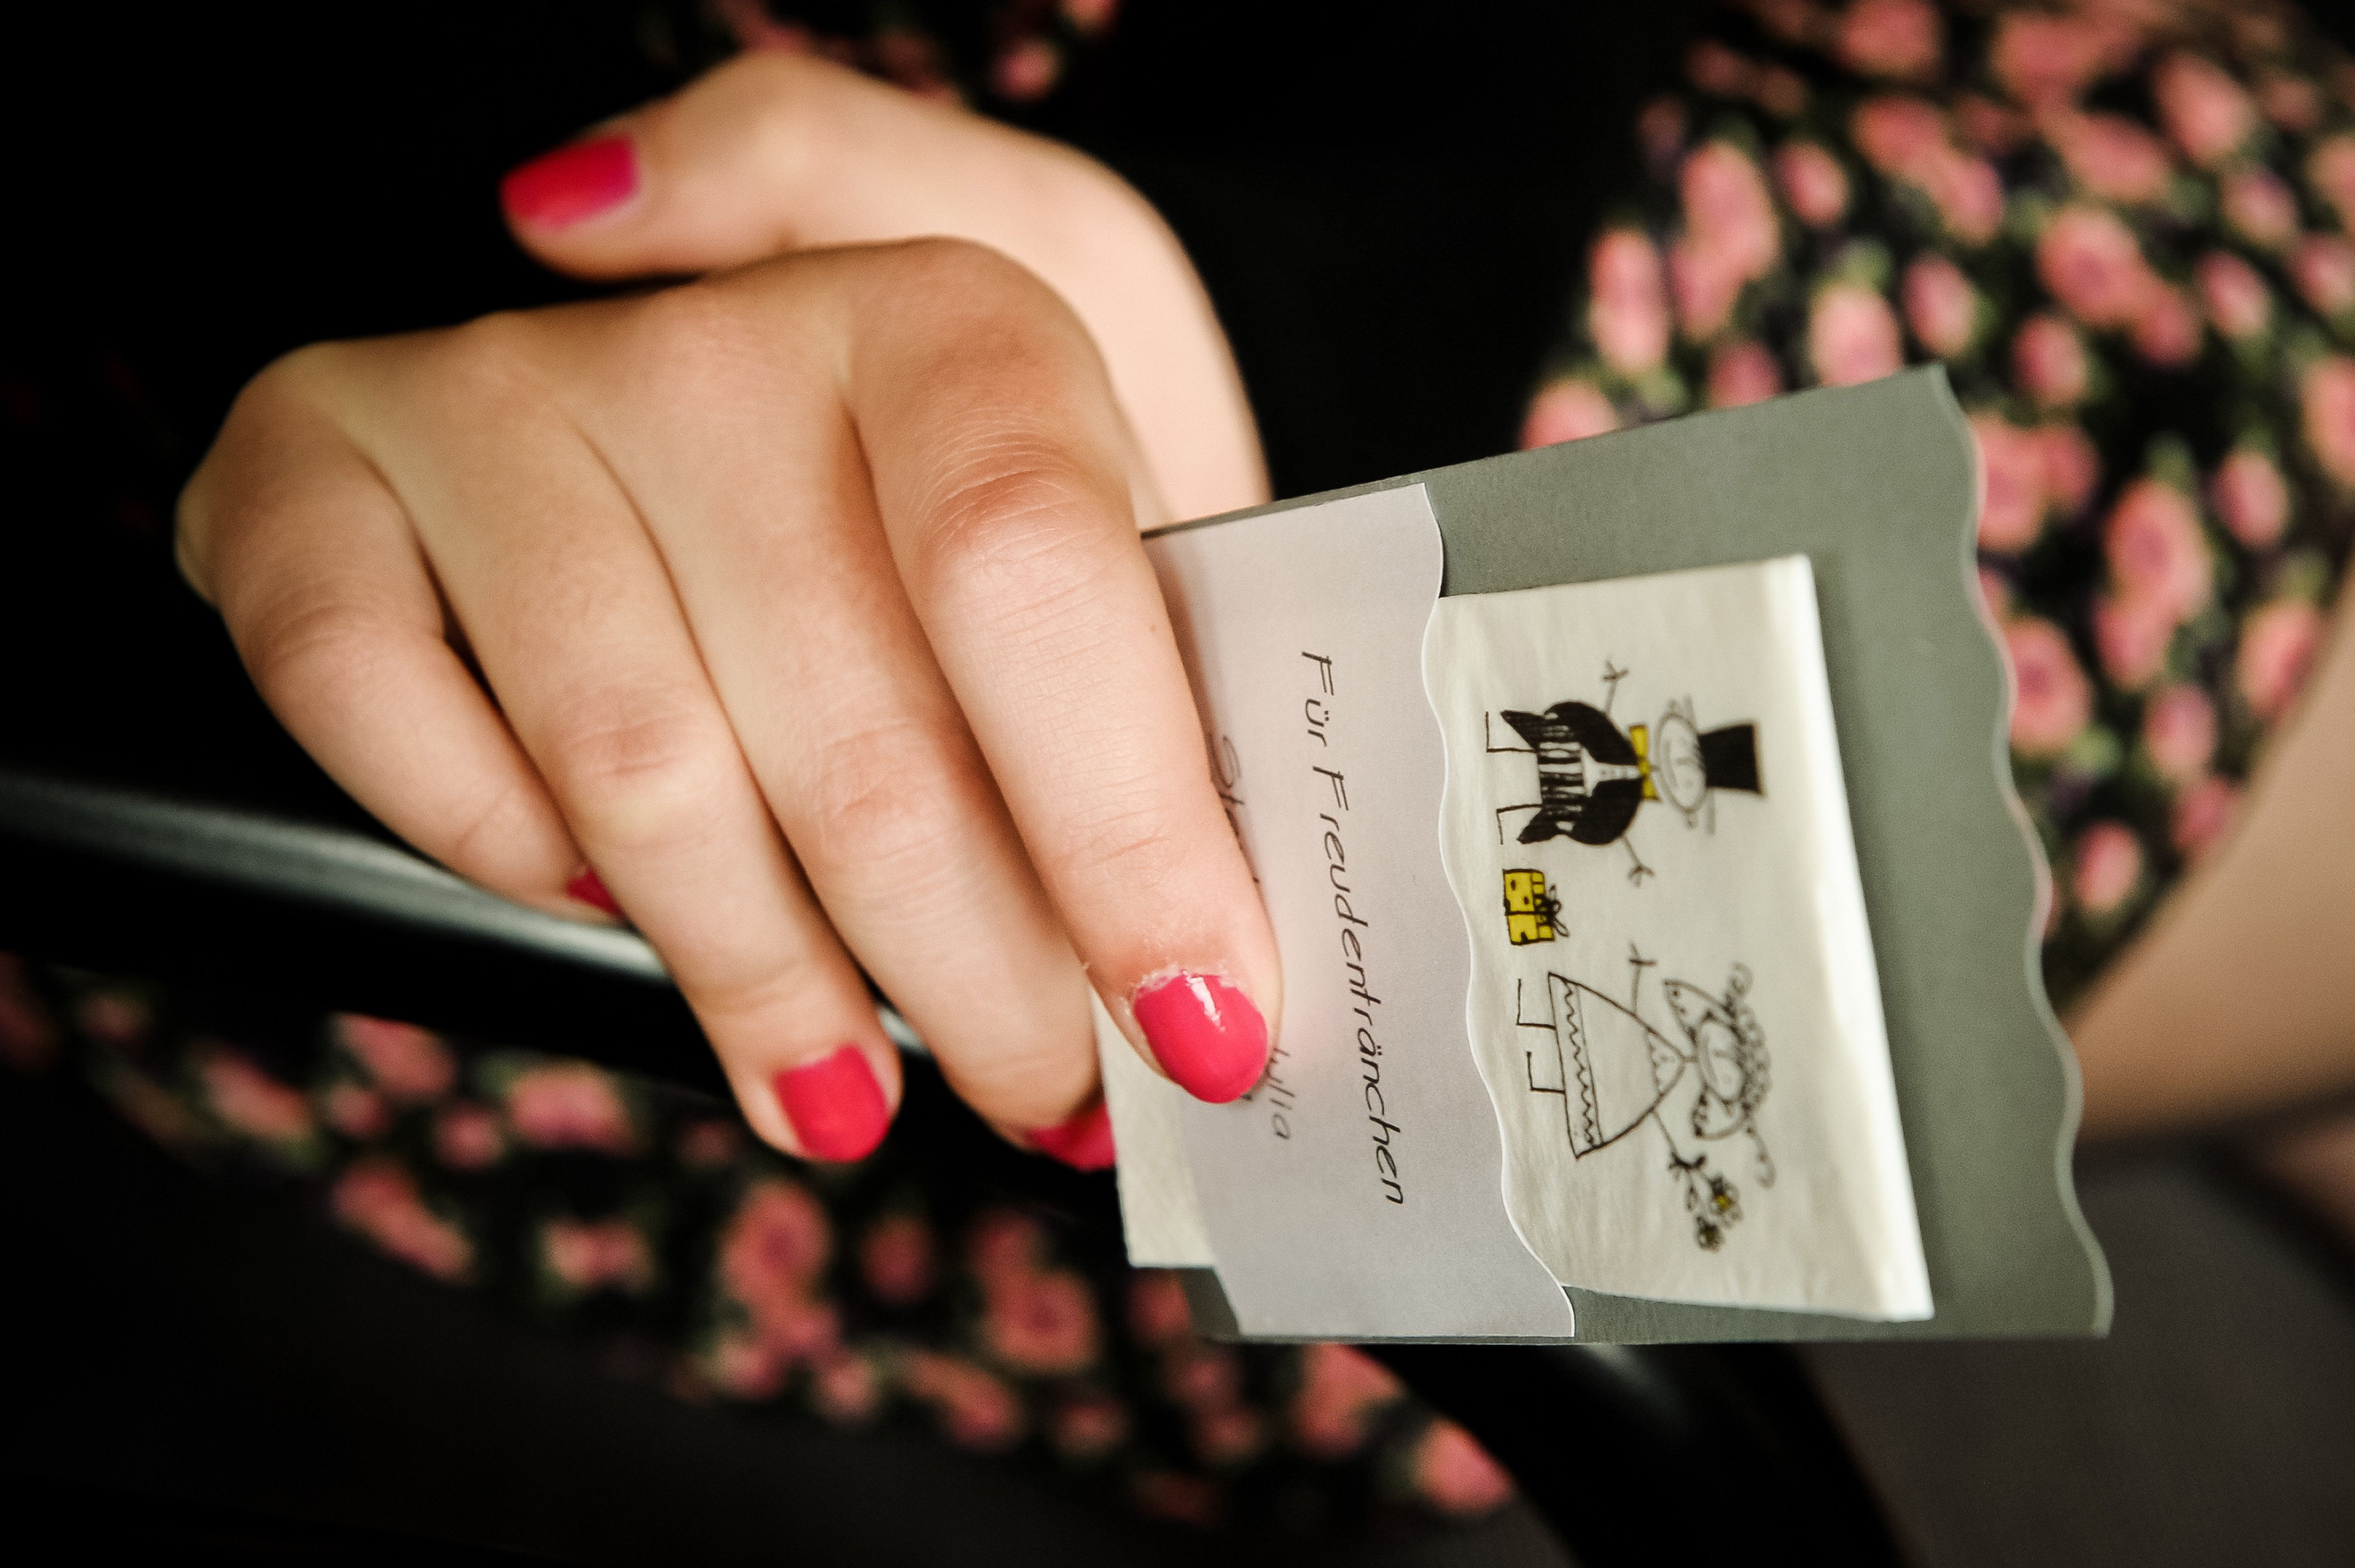 Woman with nail polish holding wedding card